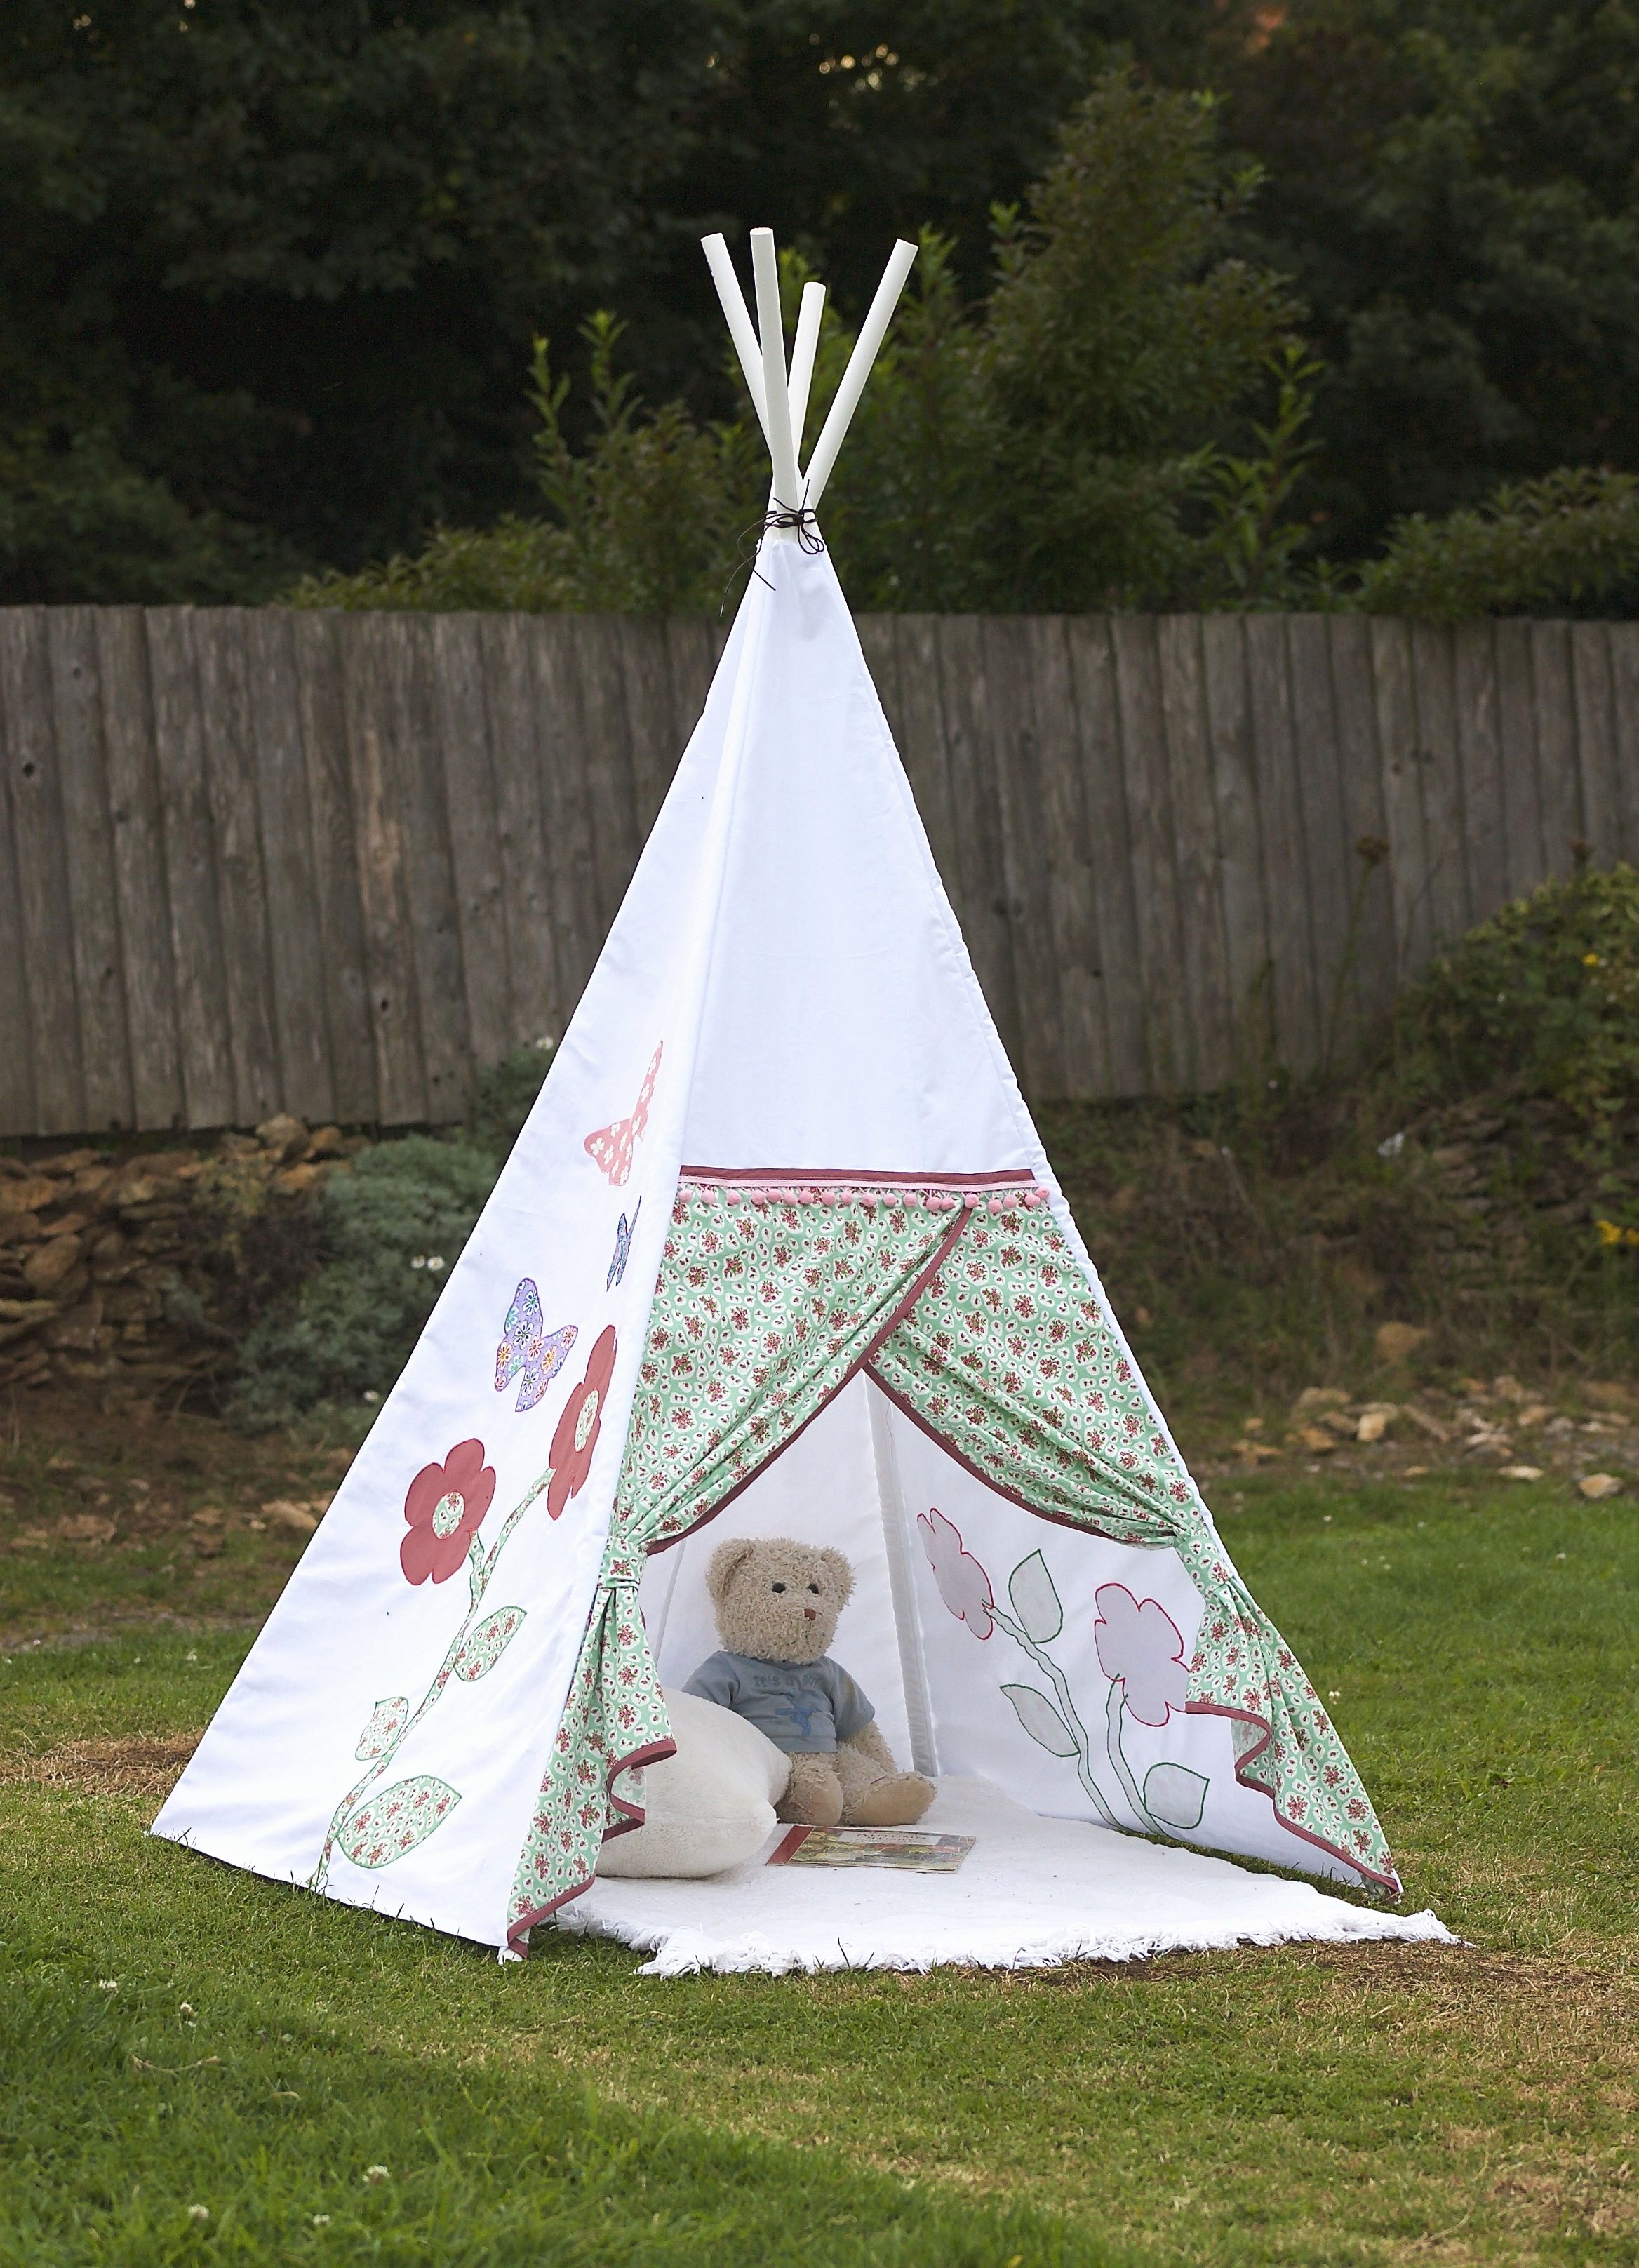 How to Make Name Tents Elegant How to Make A Child's Teepee Wigwam